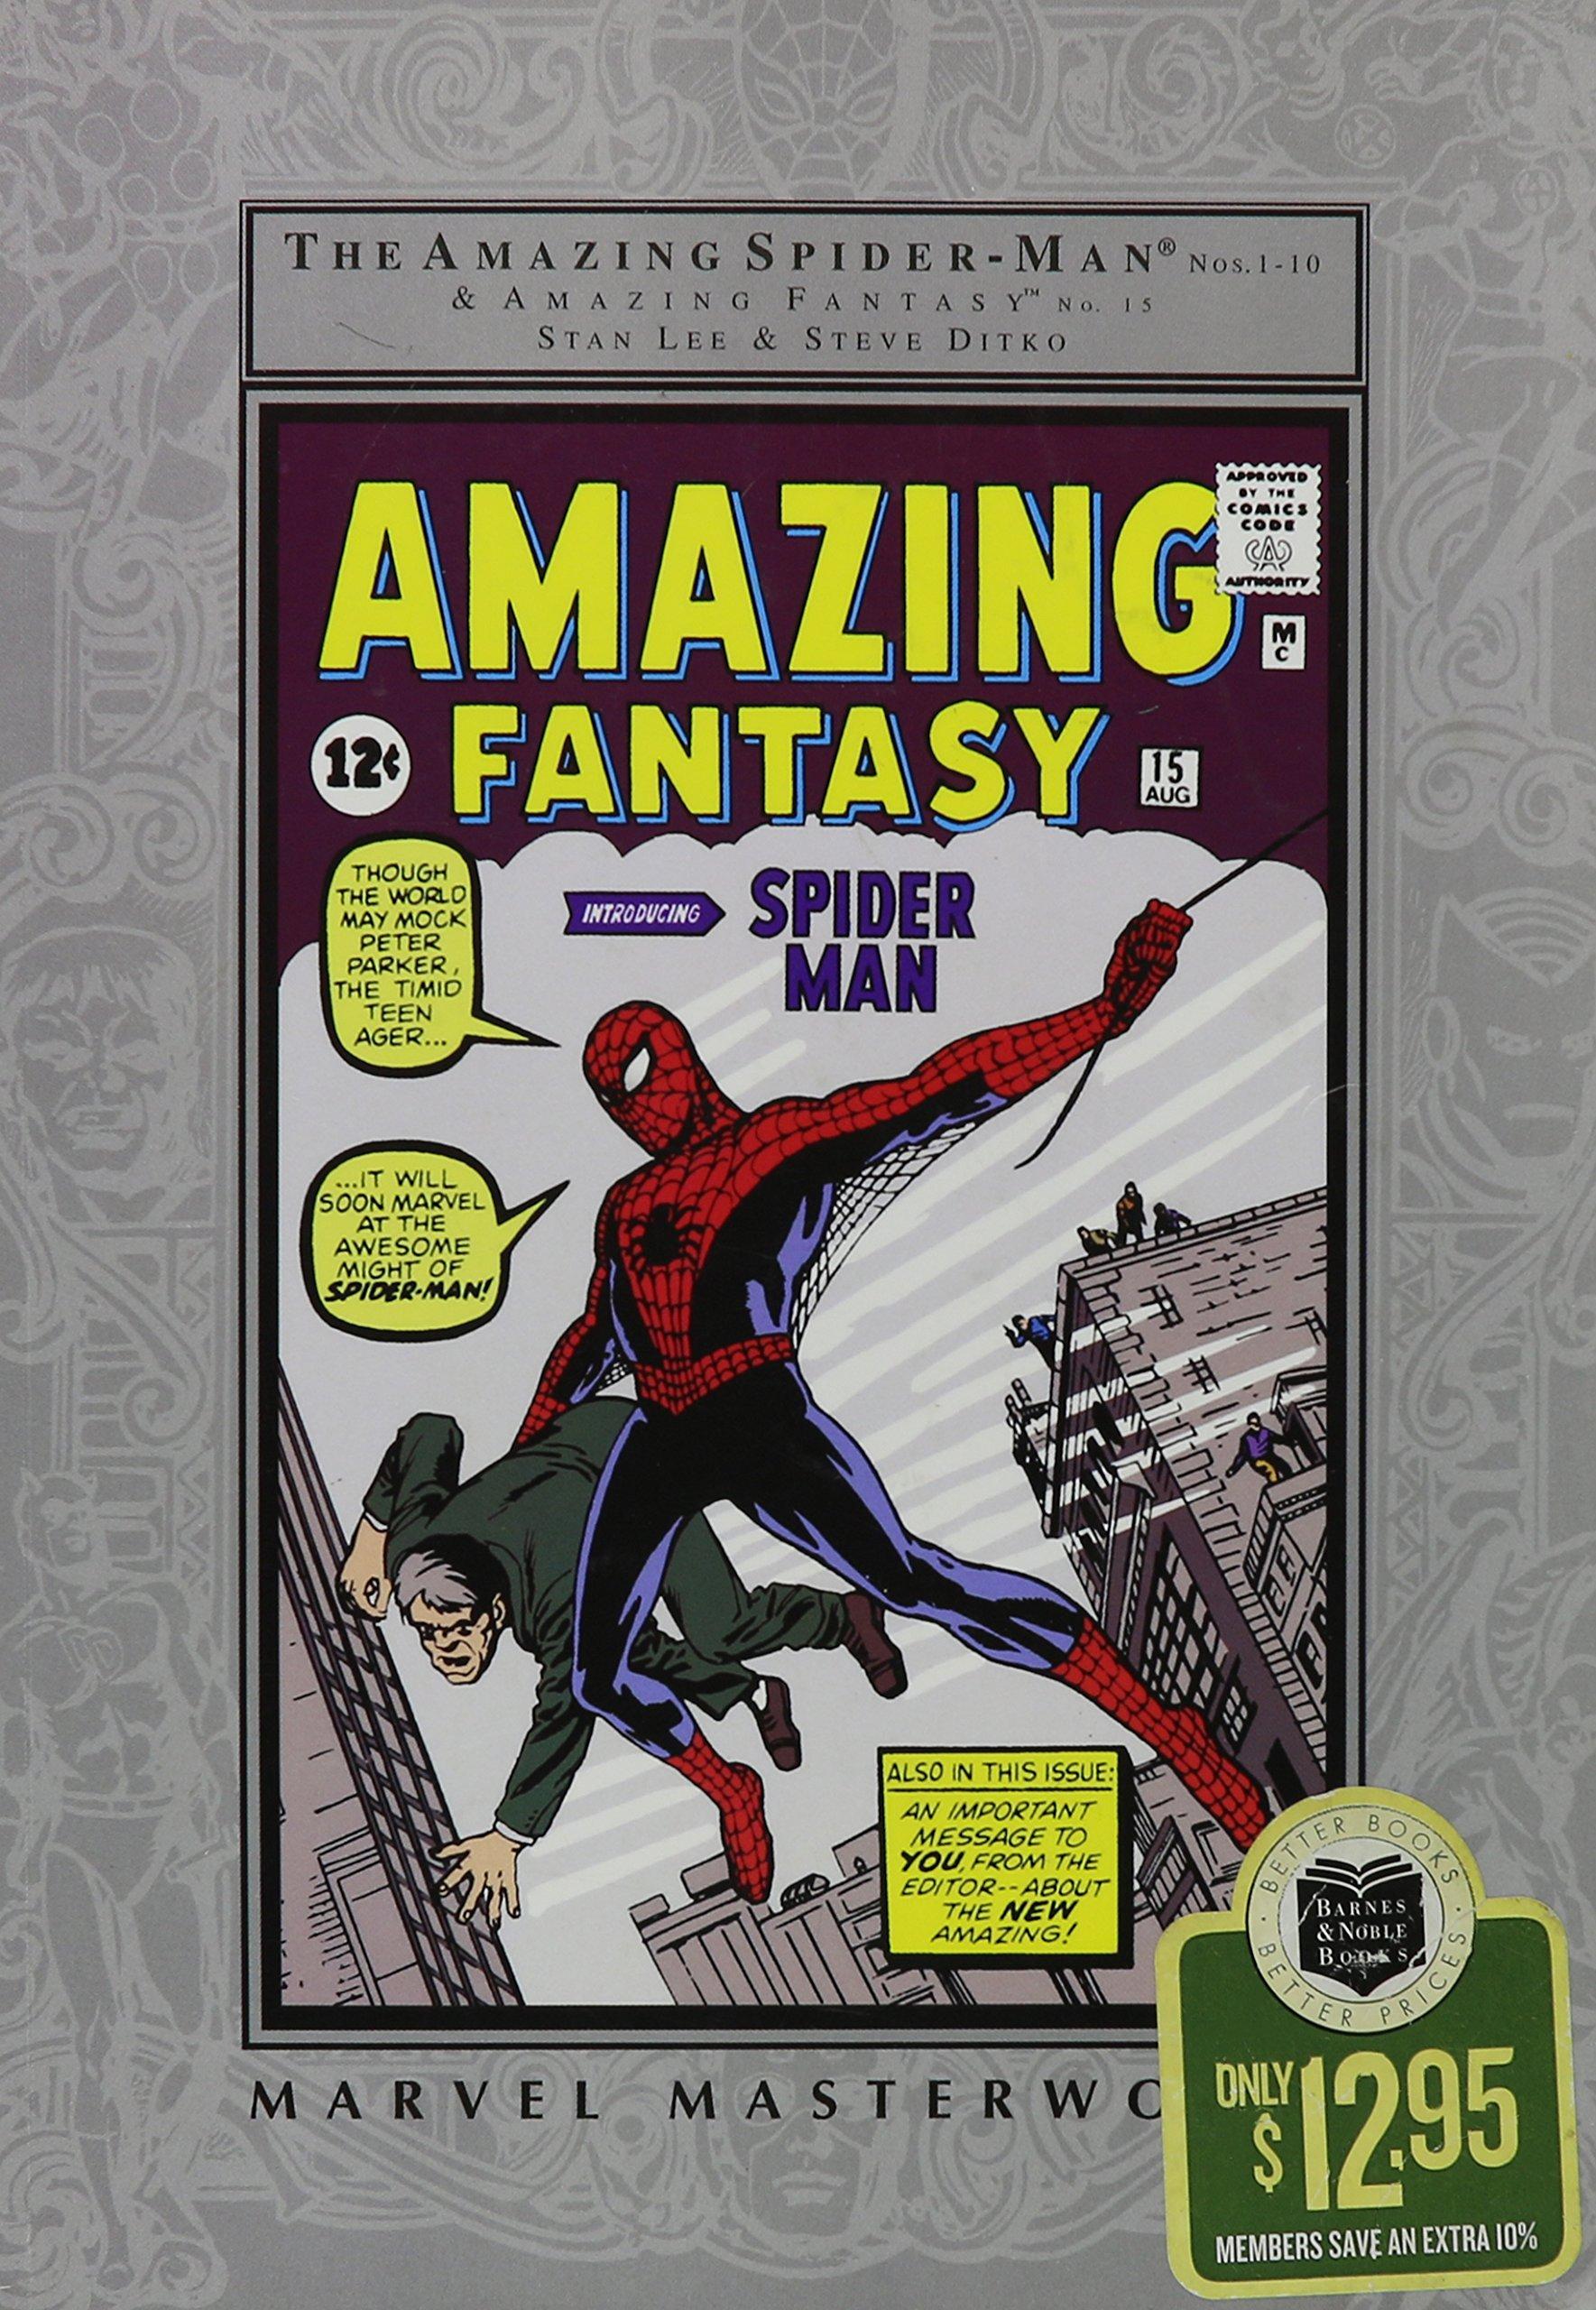 Download The Amazing Spider-Man & Amazing Fantasy No.15 ebook